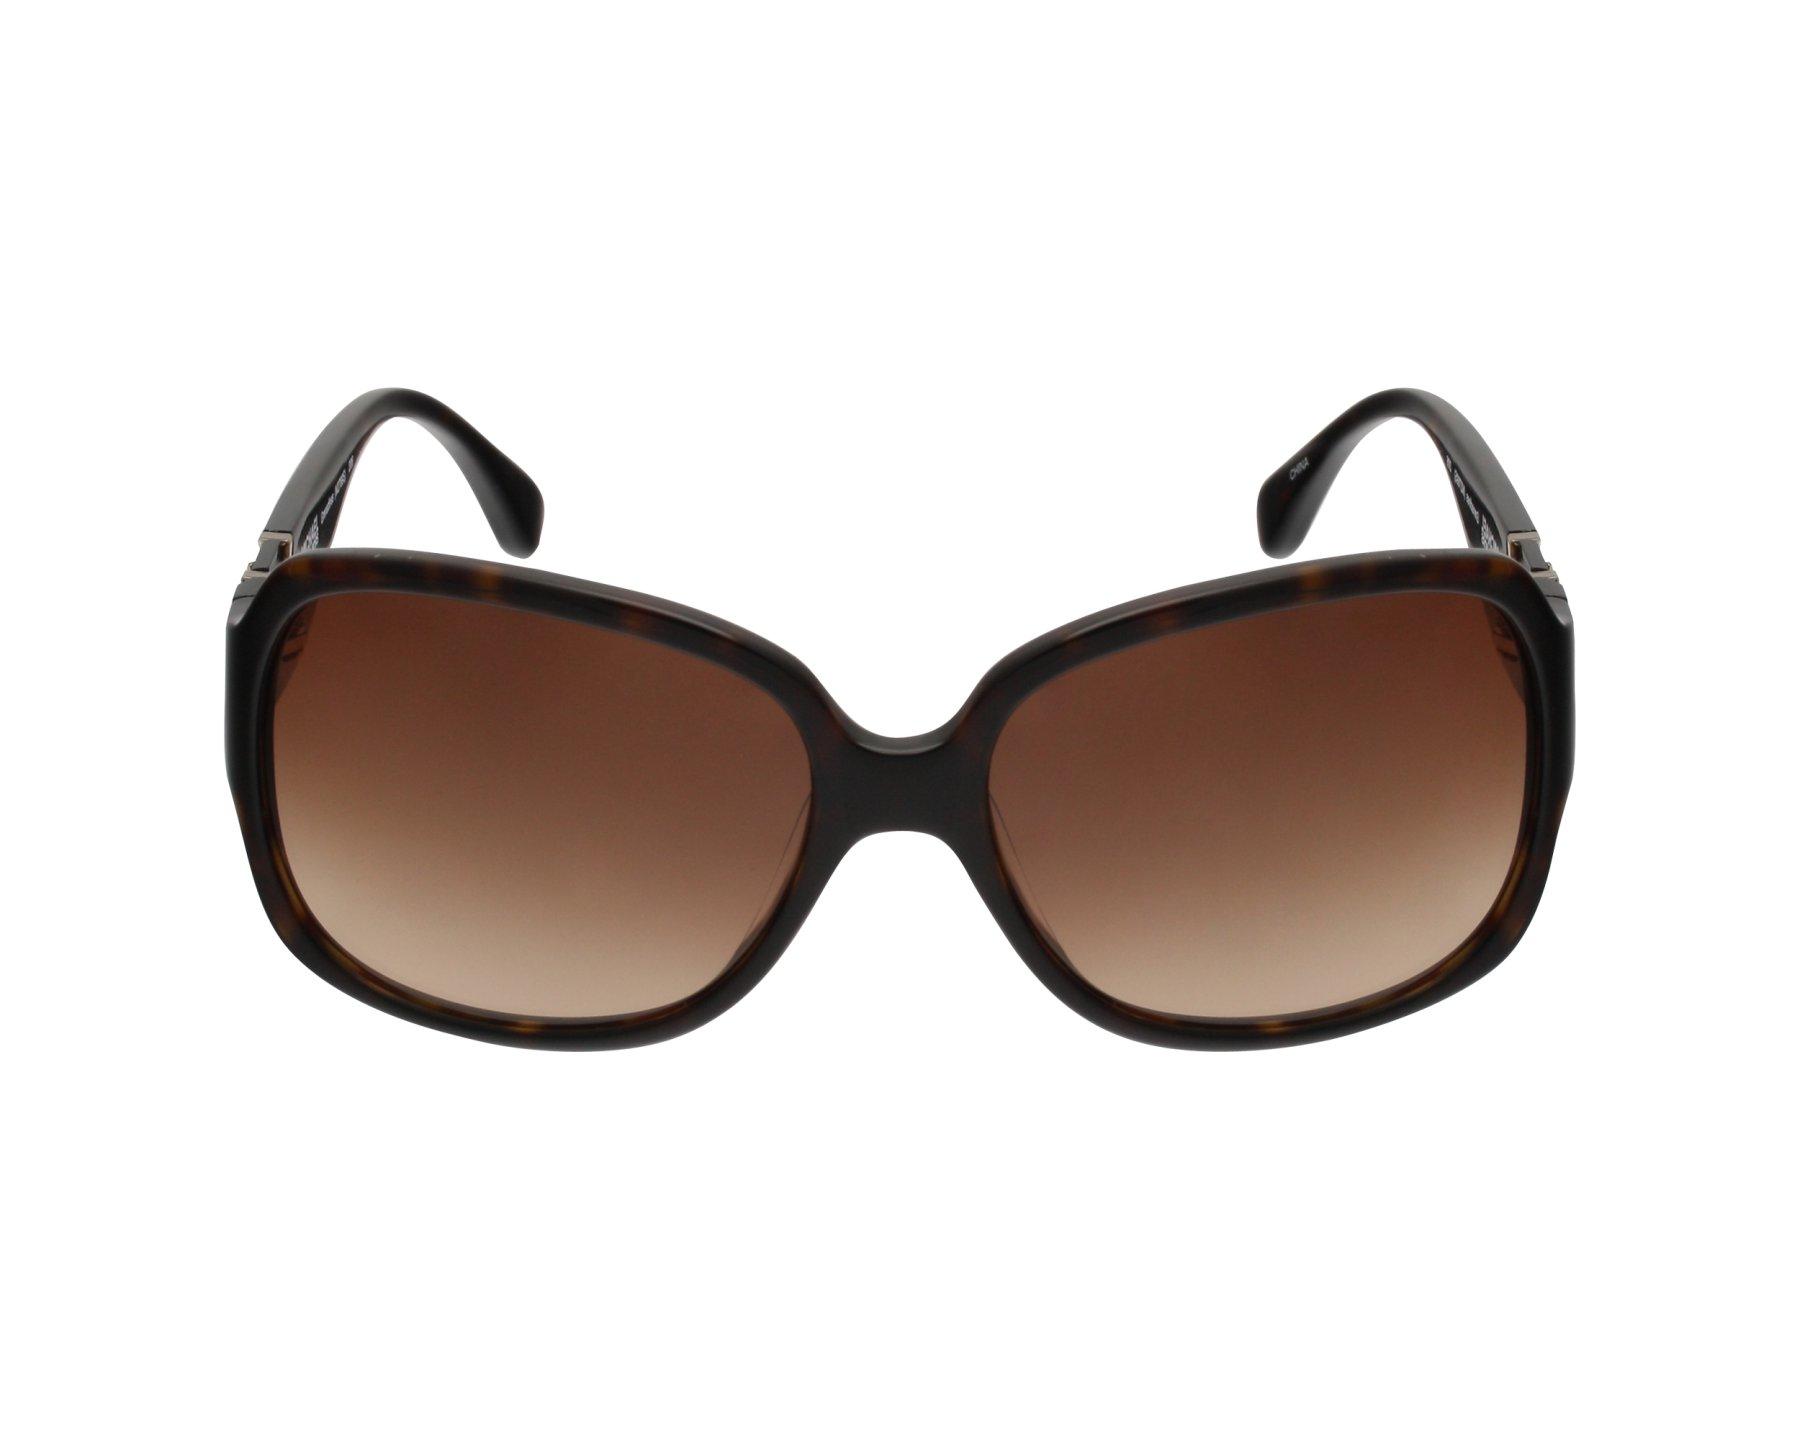 7b116dceaee8f Sunglasses Michael Kors M-2769-S 206 - Havana profile view